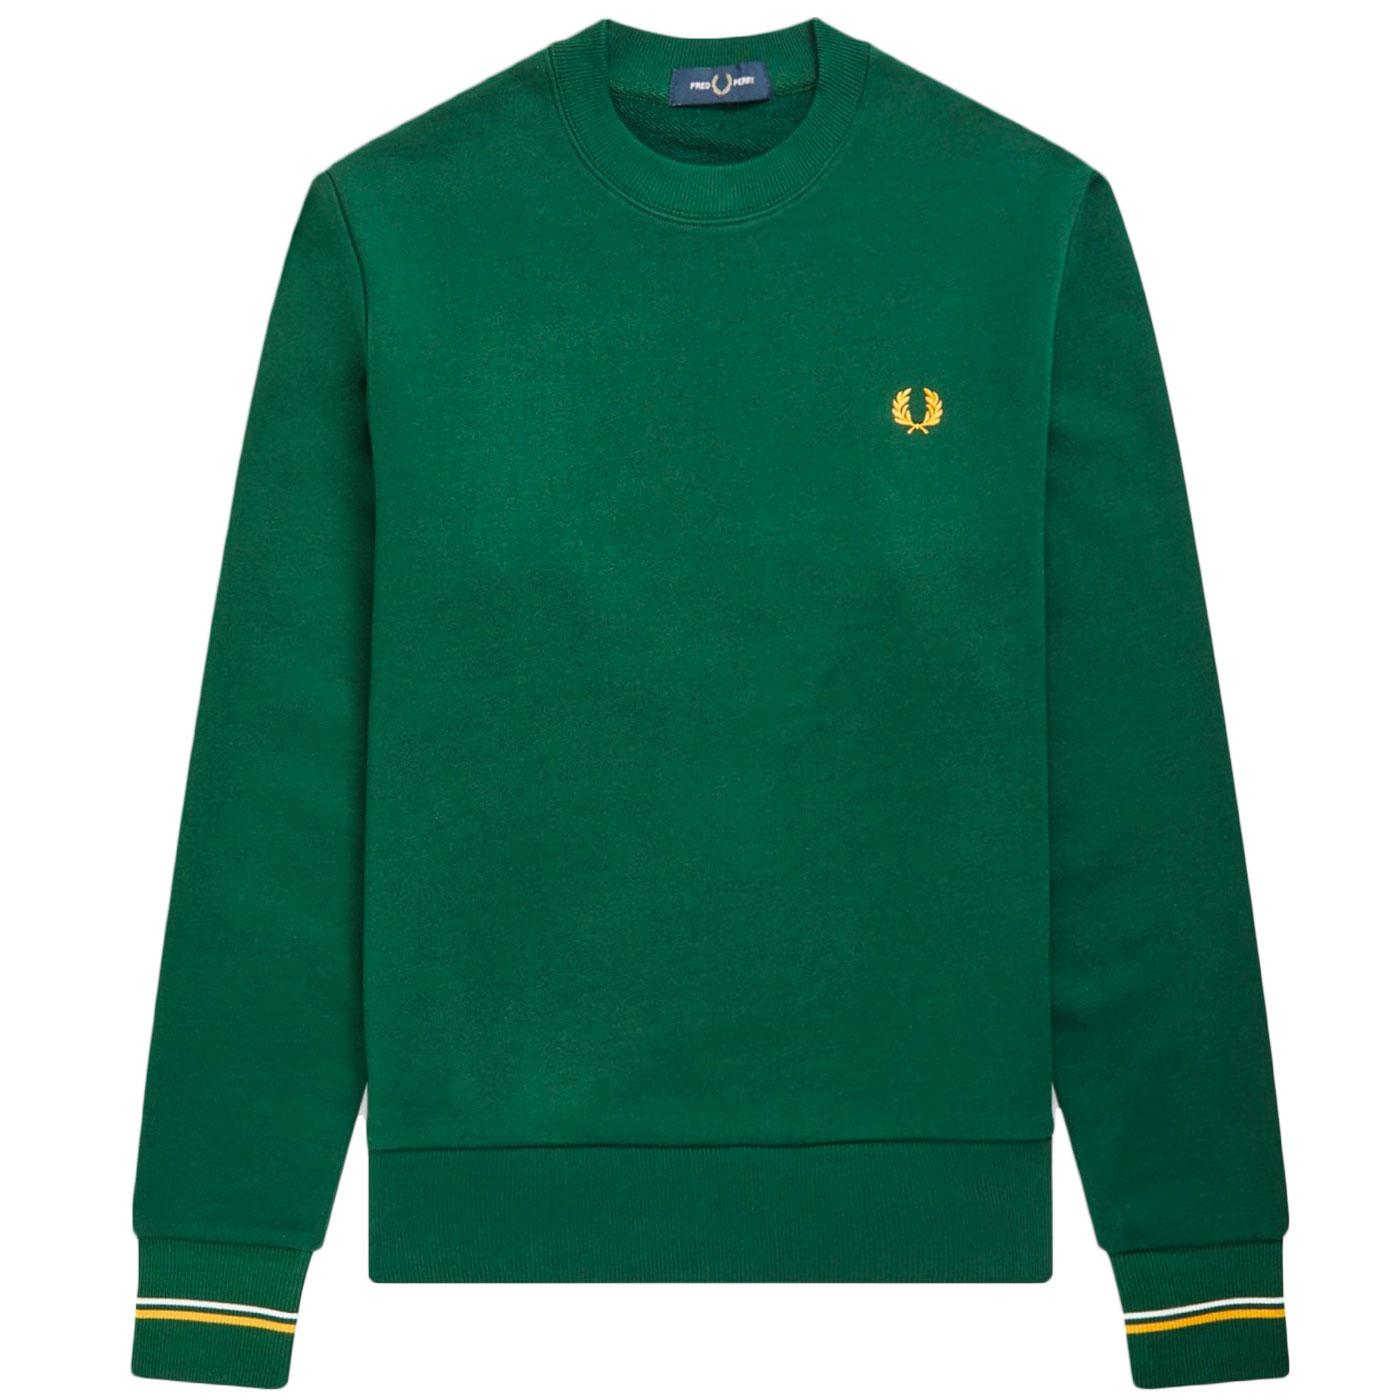 FRED PERRY Mens Classic Retro Crew Neck Sweatshirt